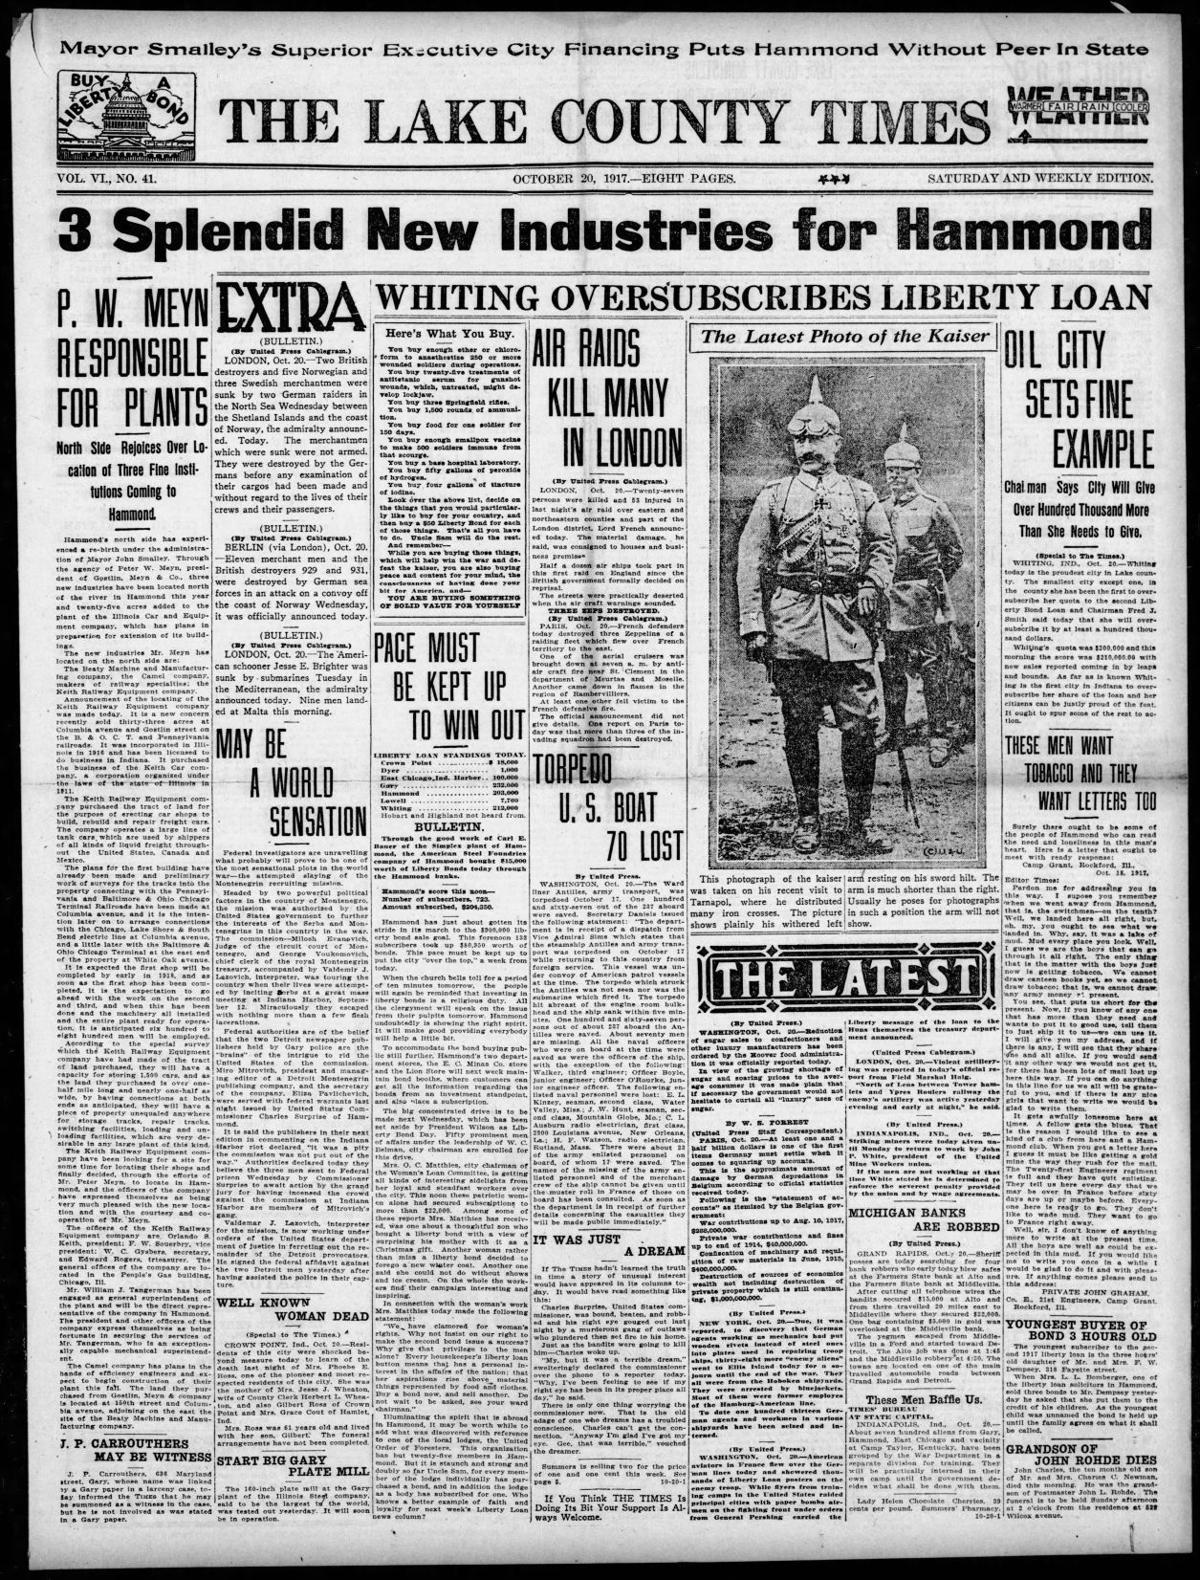 Oct. 20, 1917: 3 Splendid New Industries for Hammond